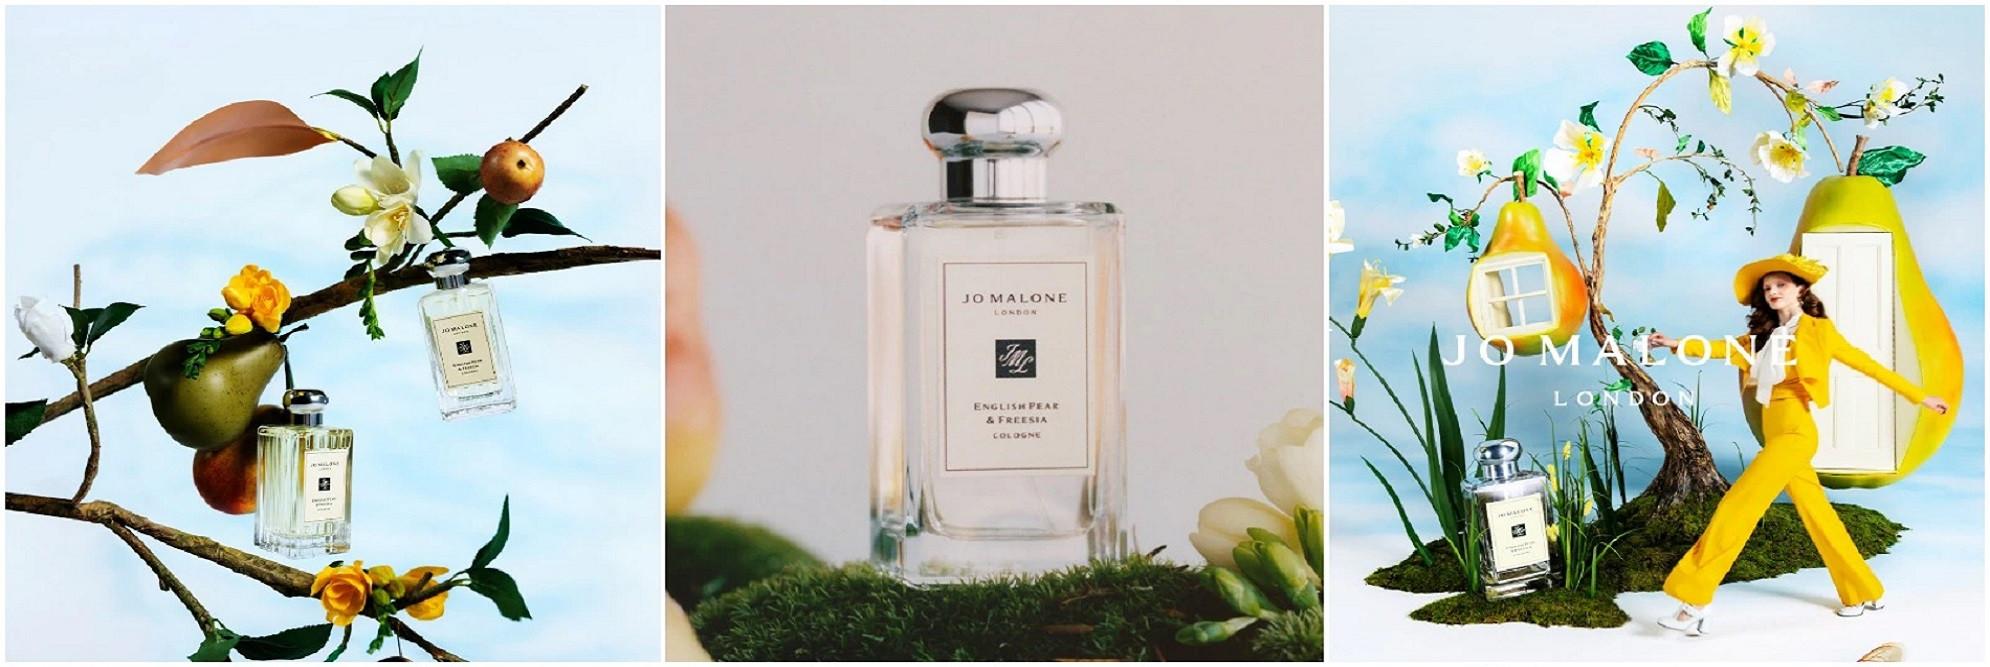 english pear & fresia jo malone limited edition